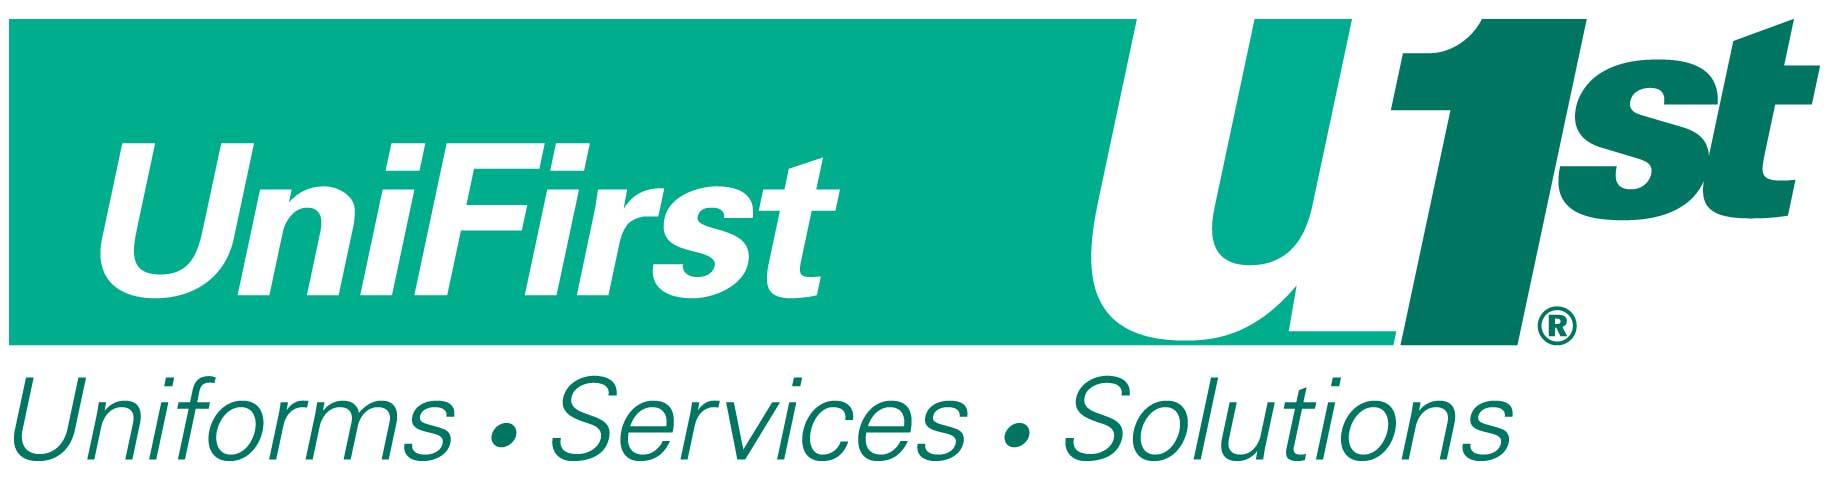 UniFirst Corp logo